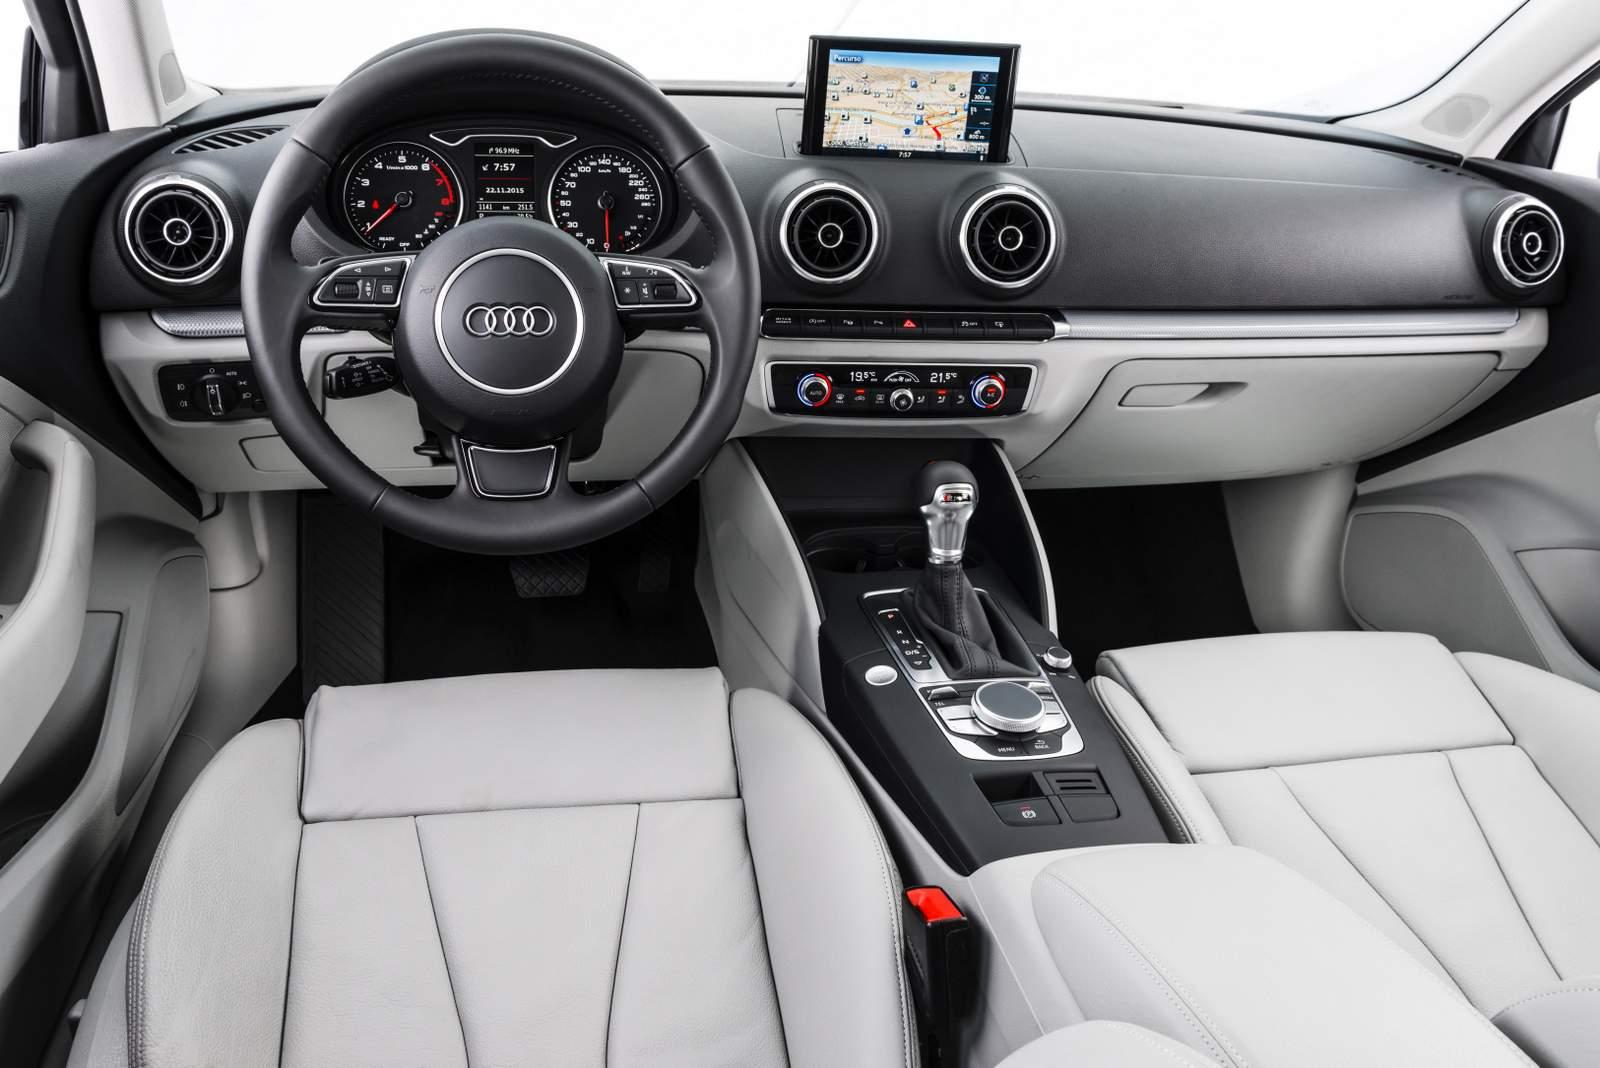 Audi A3 Sedan 2.0 Ambition 2016 - interior